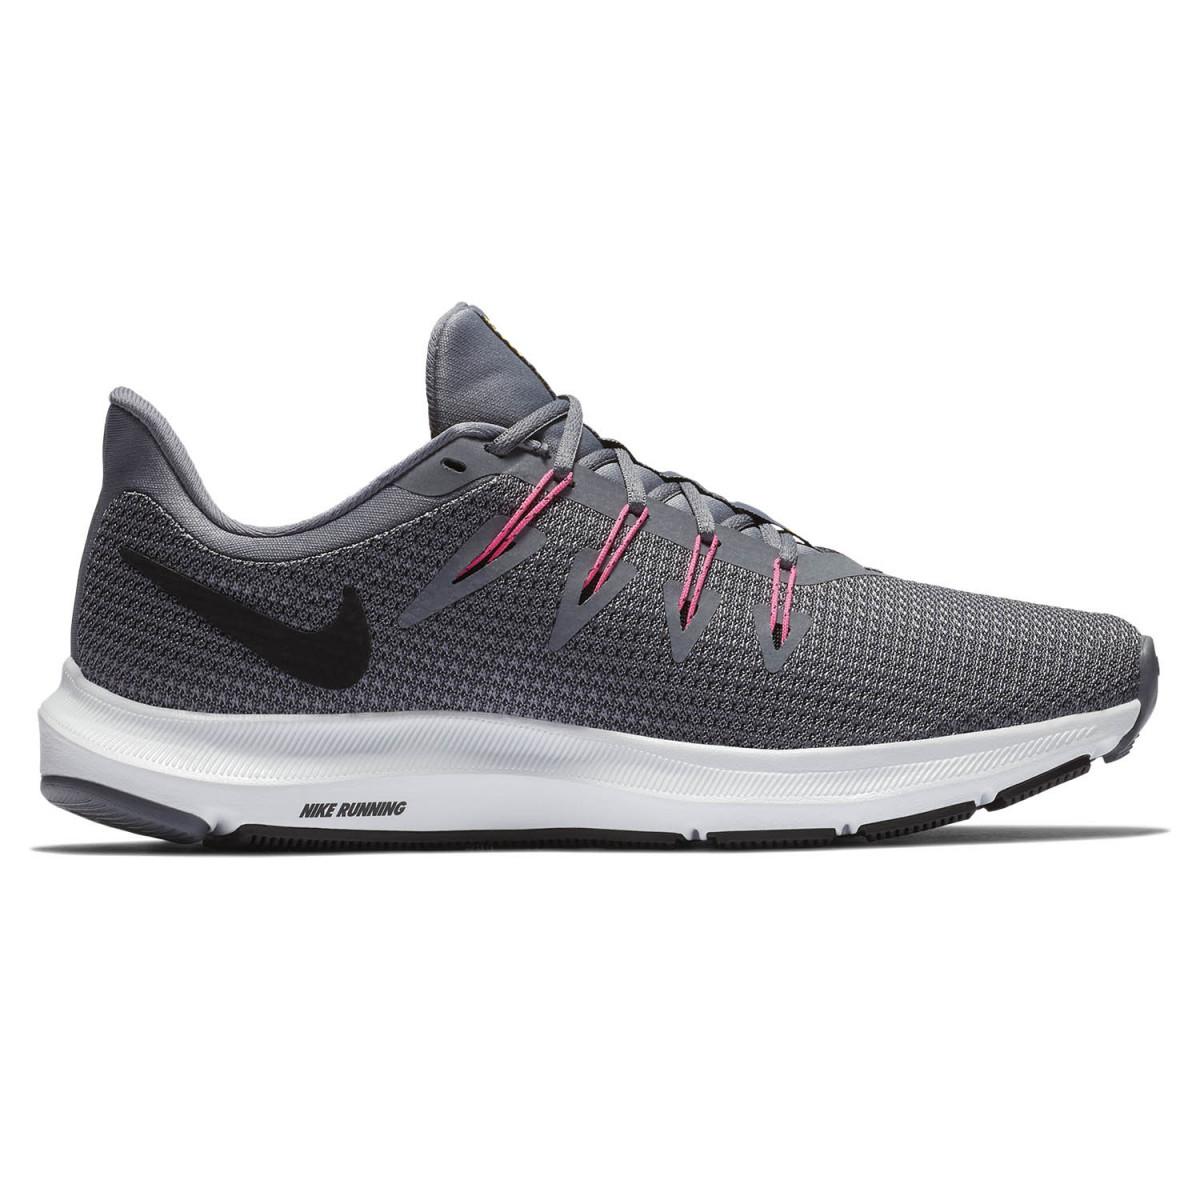 a3ea7d606a0 Zapatillas Nike Quest - Running - Zapatillas - Mujer